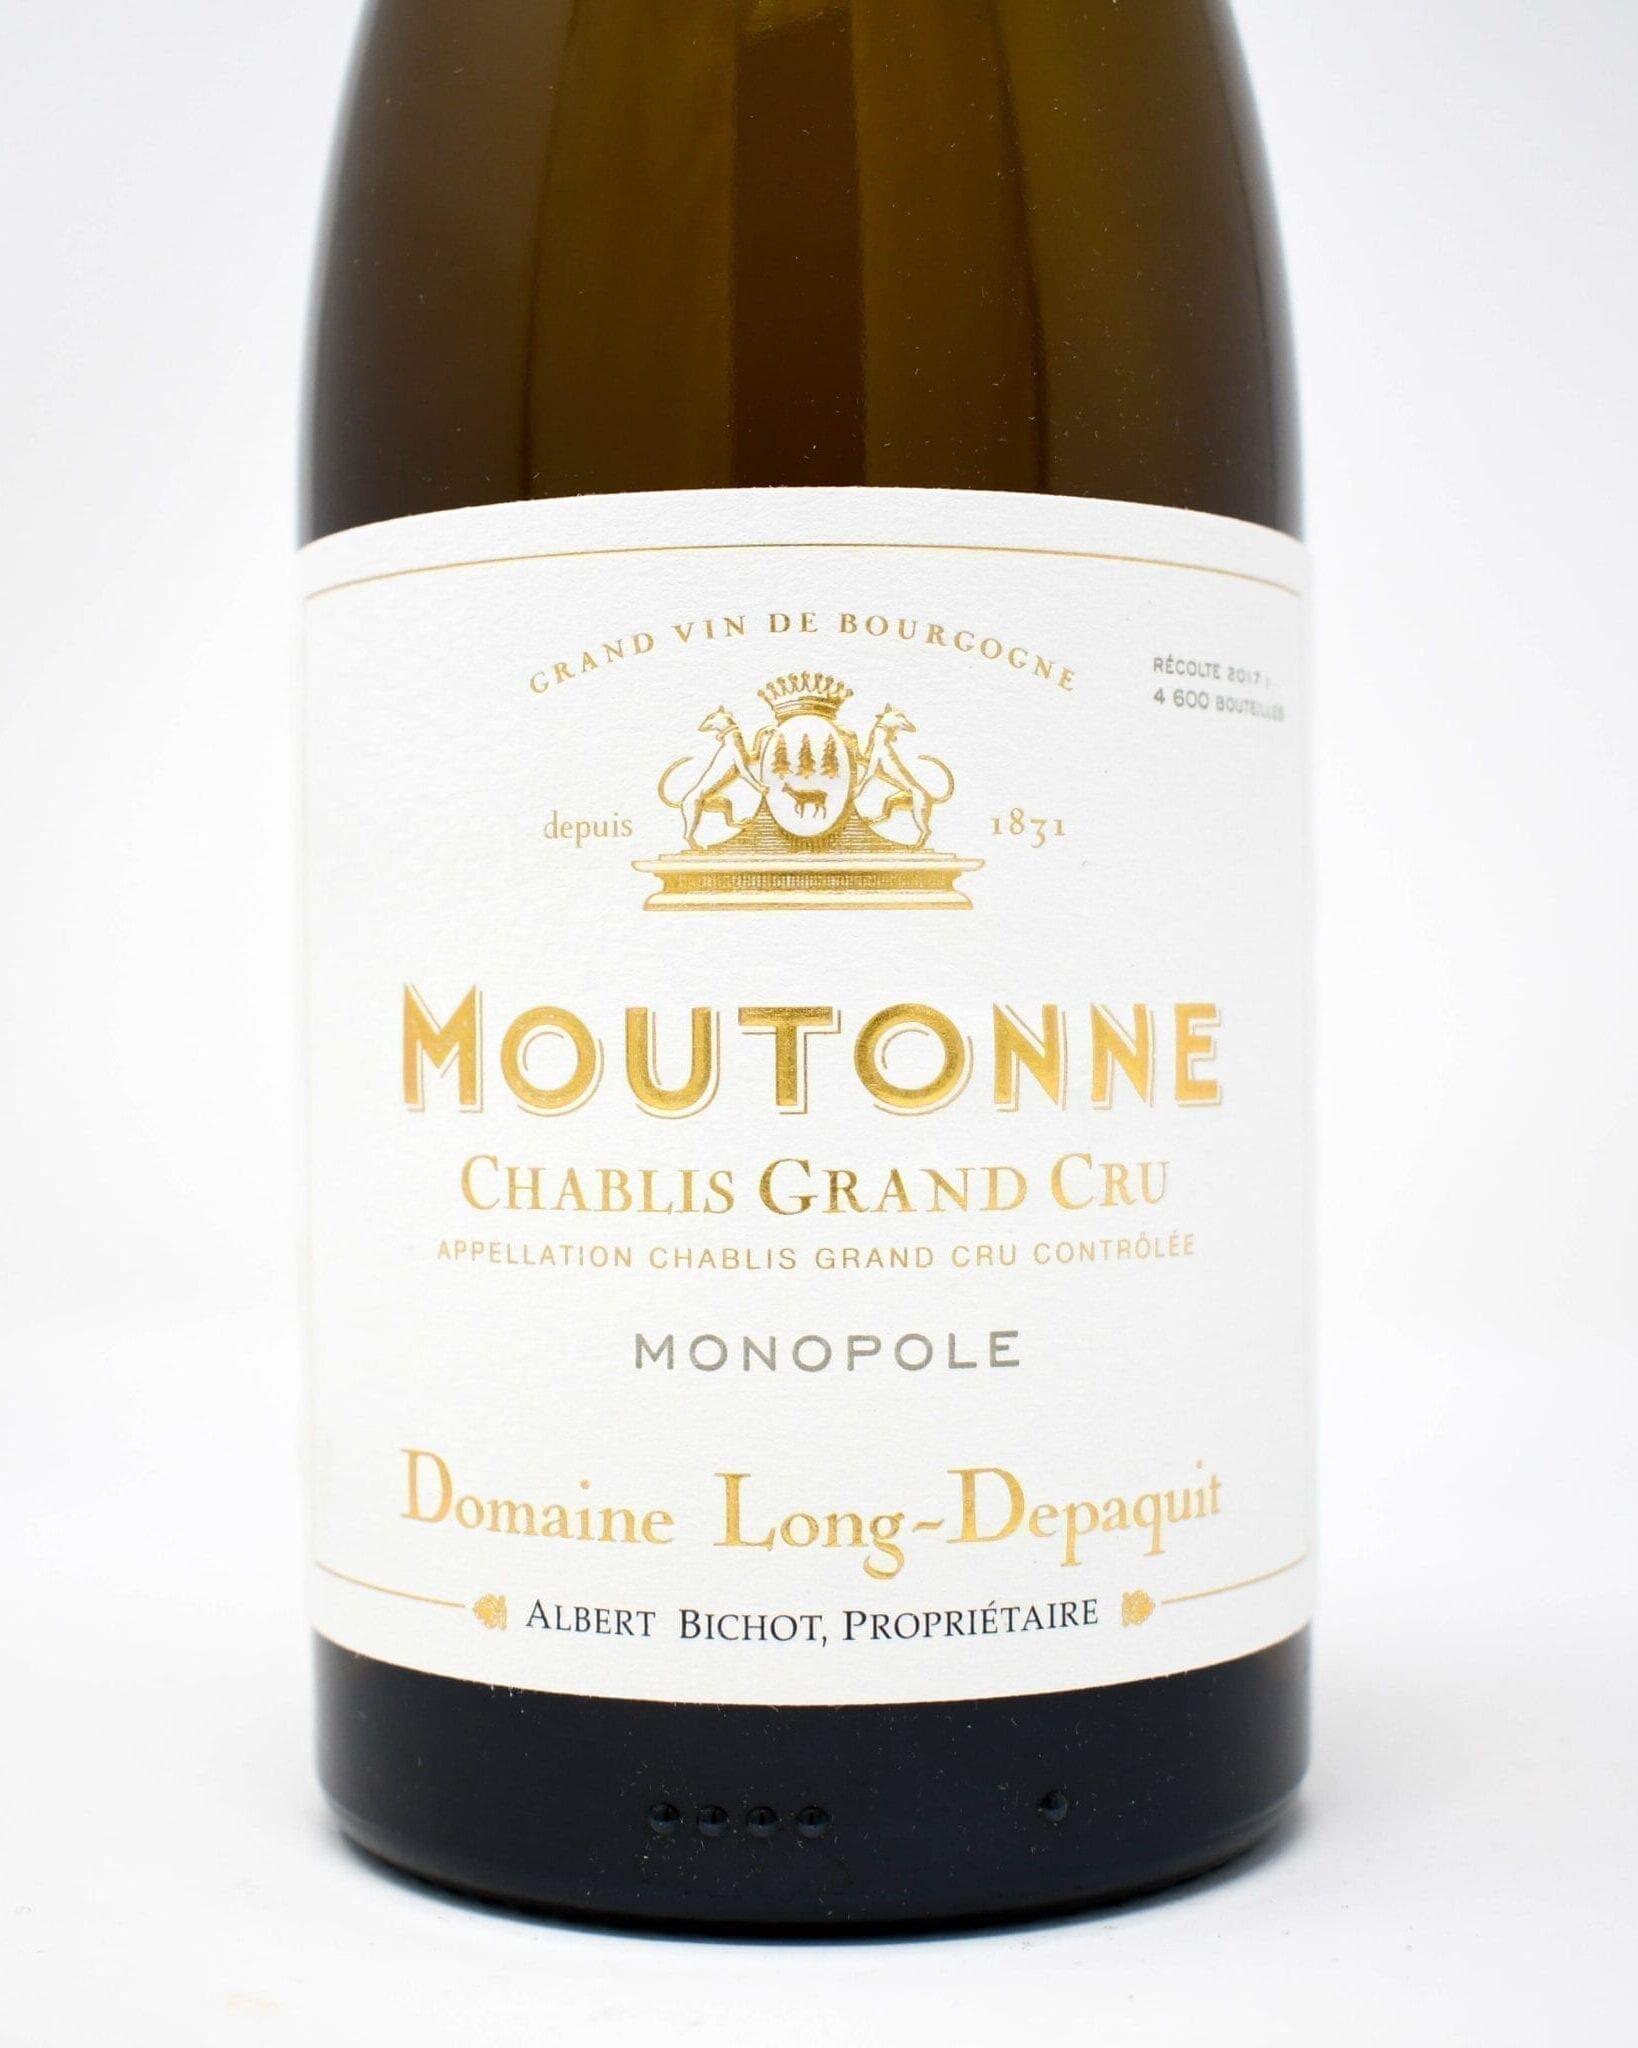 Long-Depaquit, Moutonne, Chablis Grand Cru